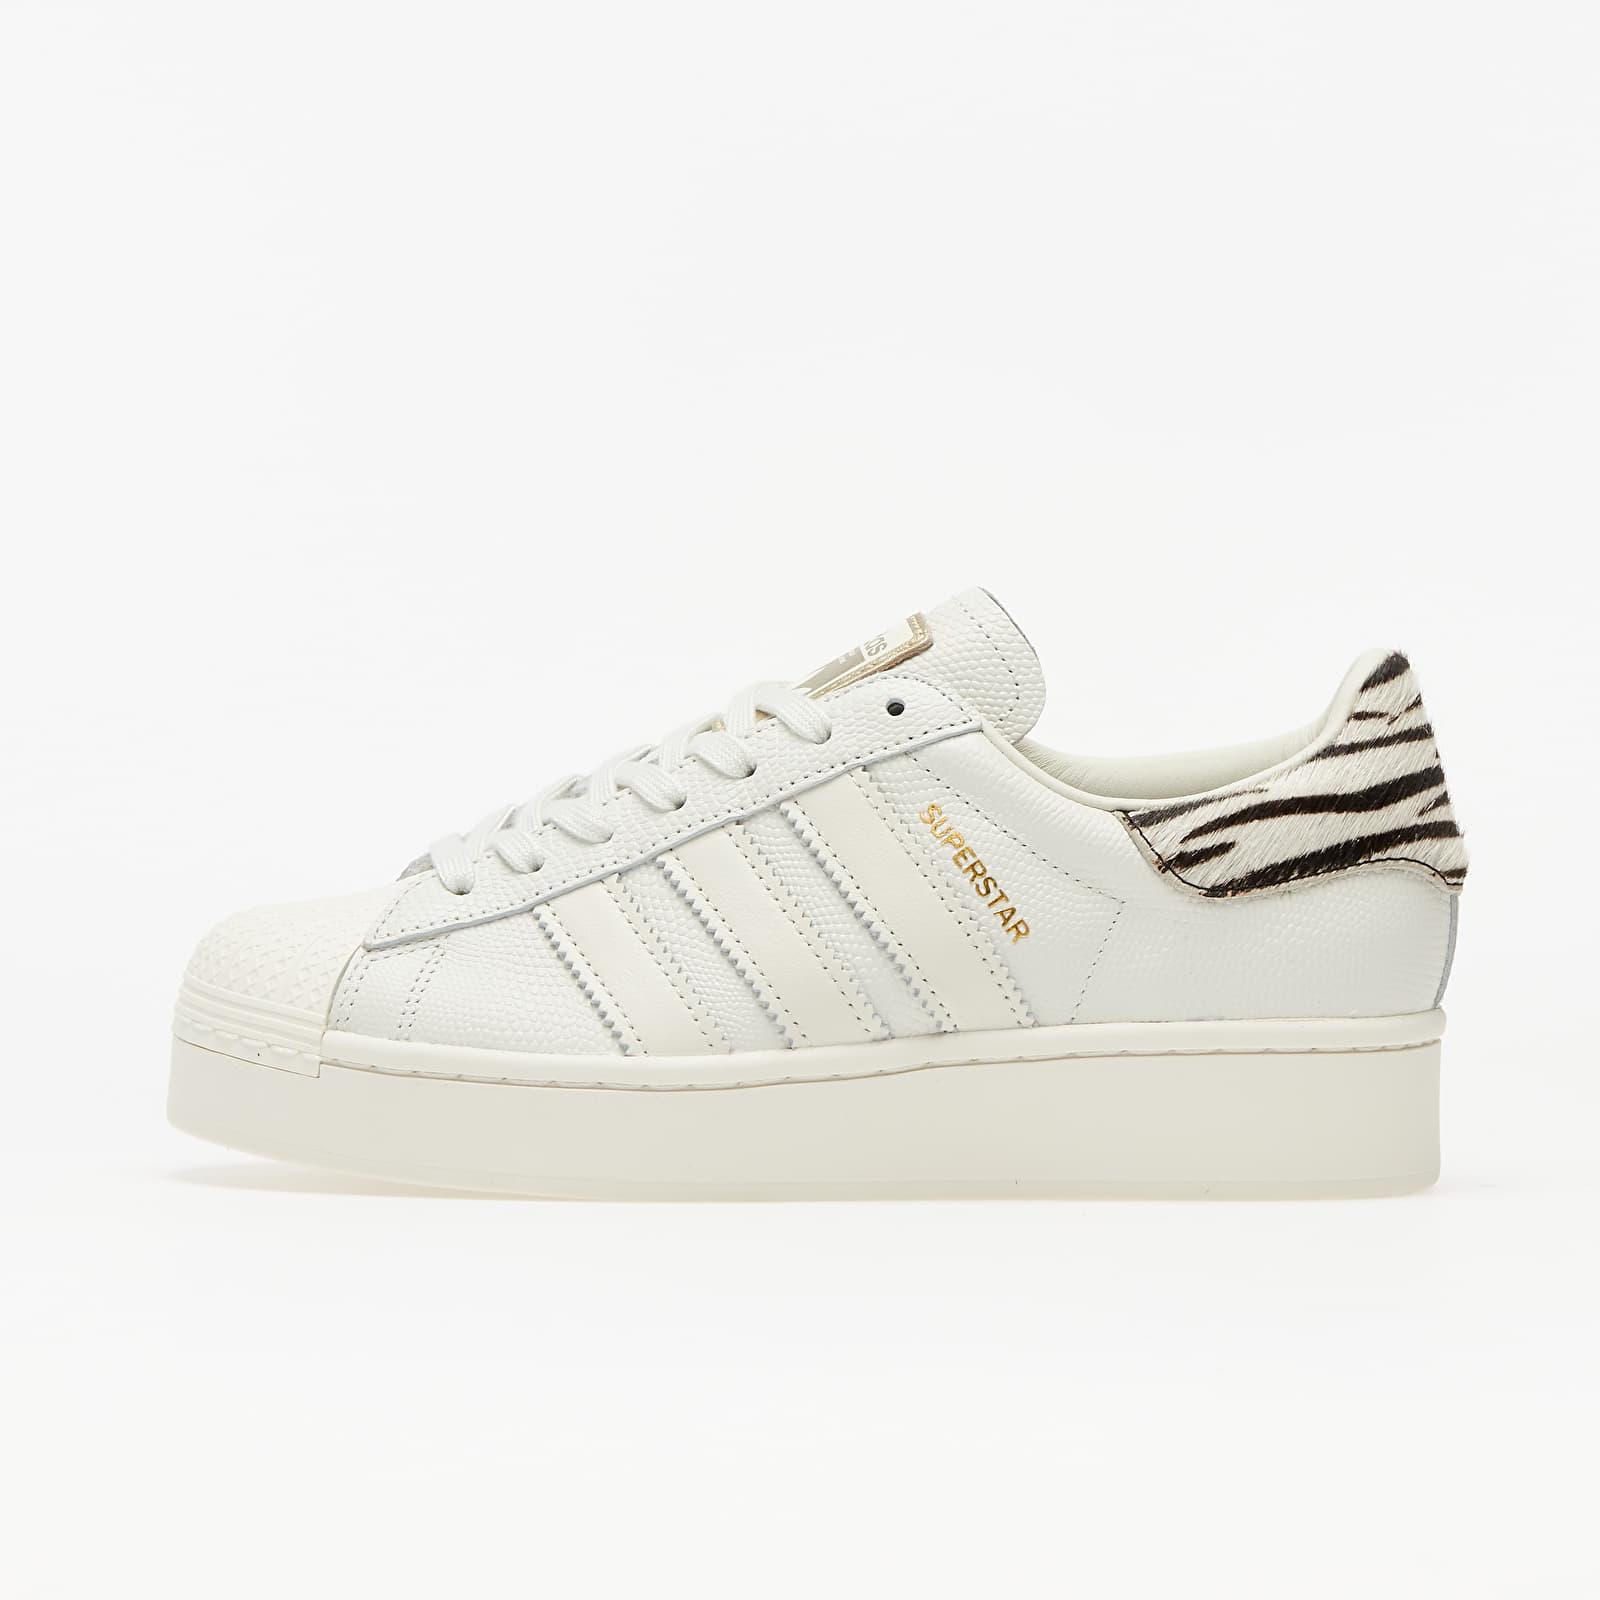 Női cipők adidas Superstar Bold W White Tint/ Off White/ Core Black